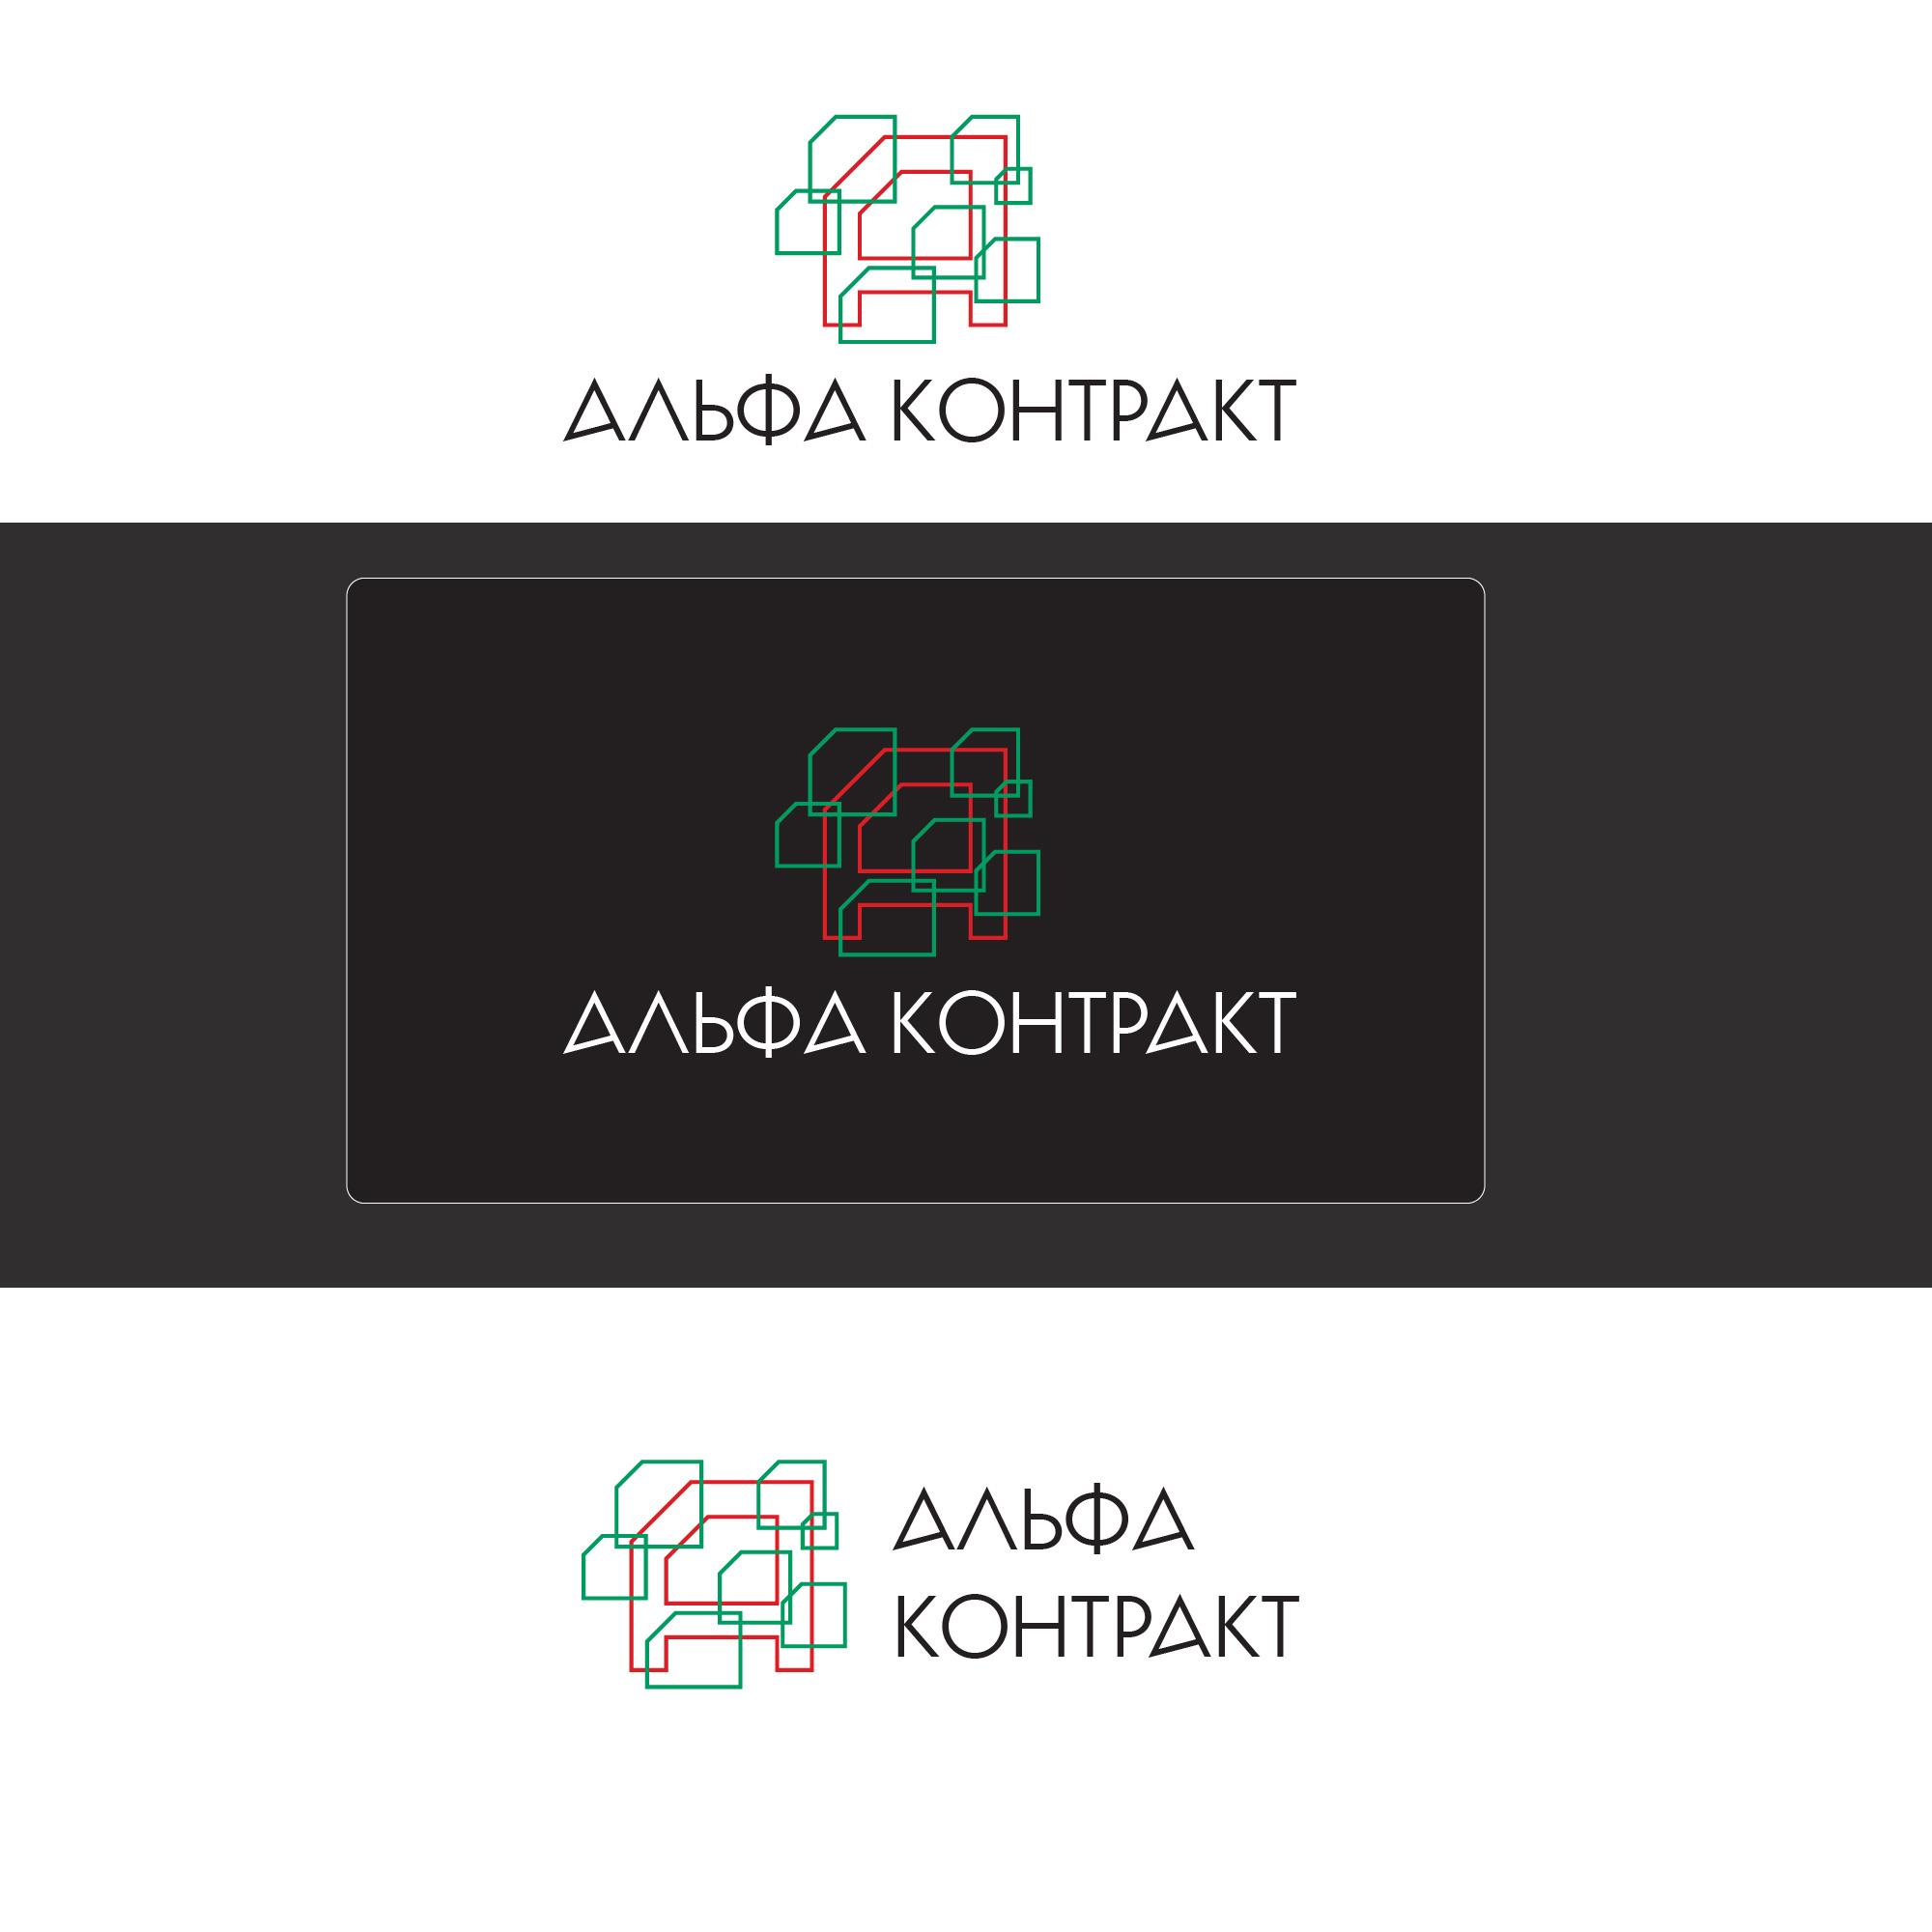 Дизайнер для разработки логотипа компании фото f_8075bf91540a2463.jpg